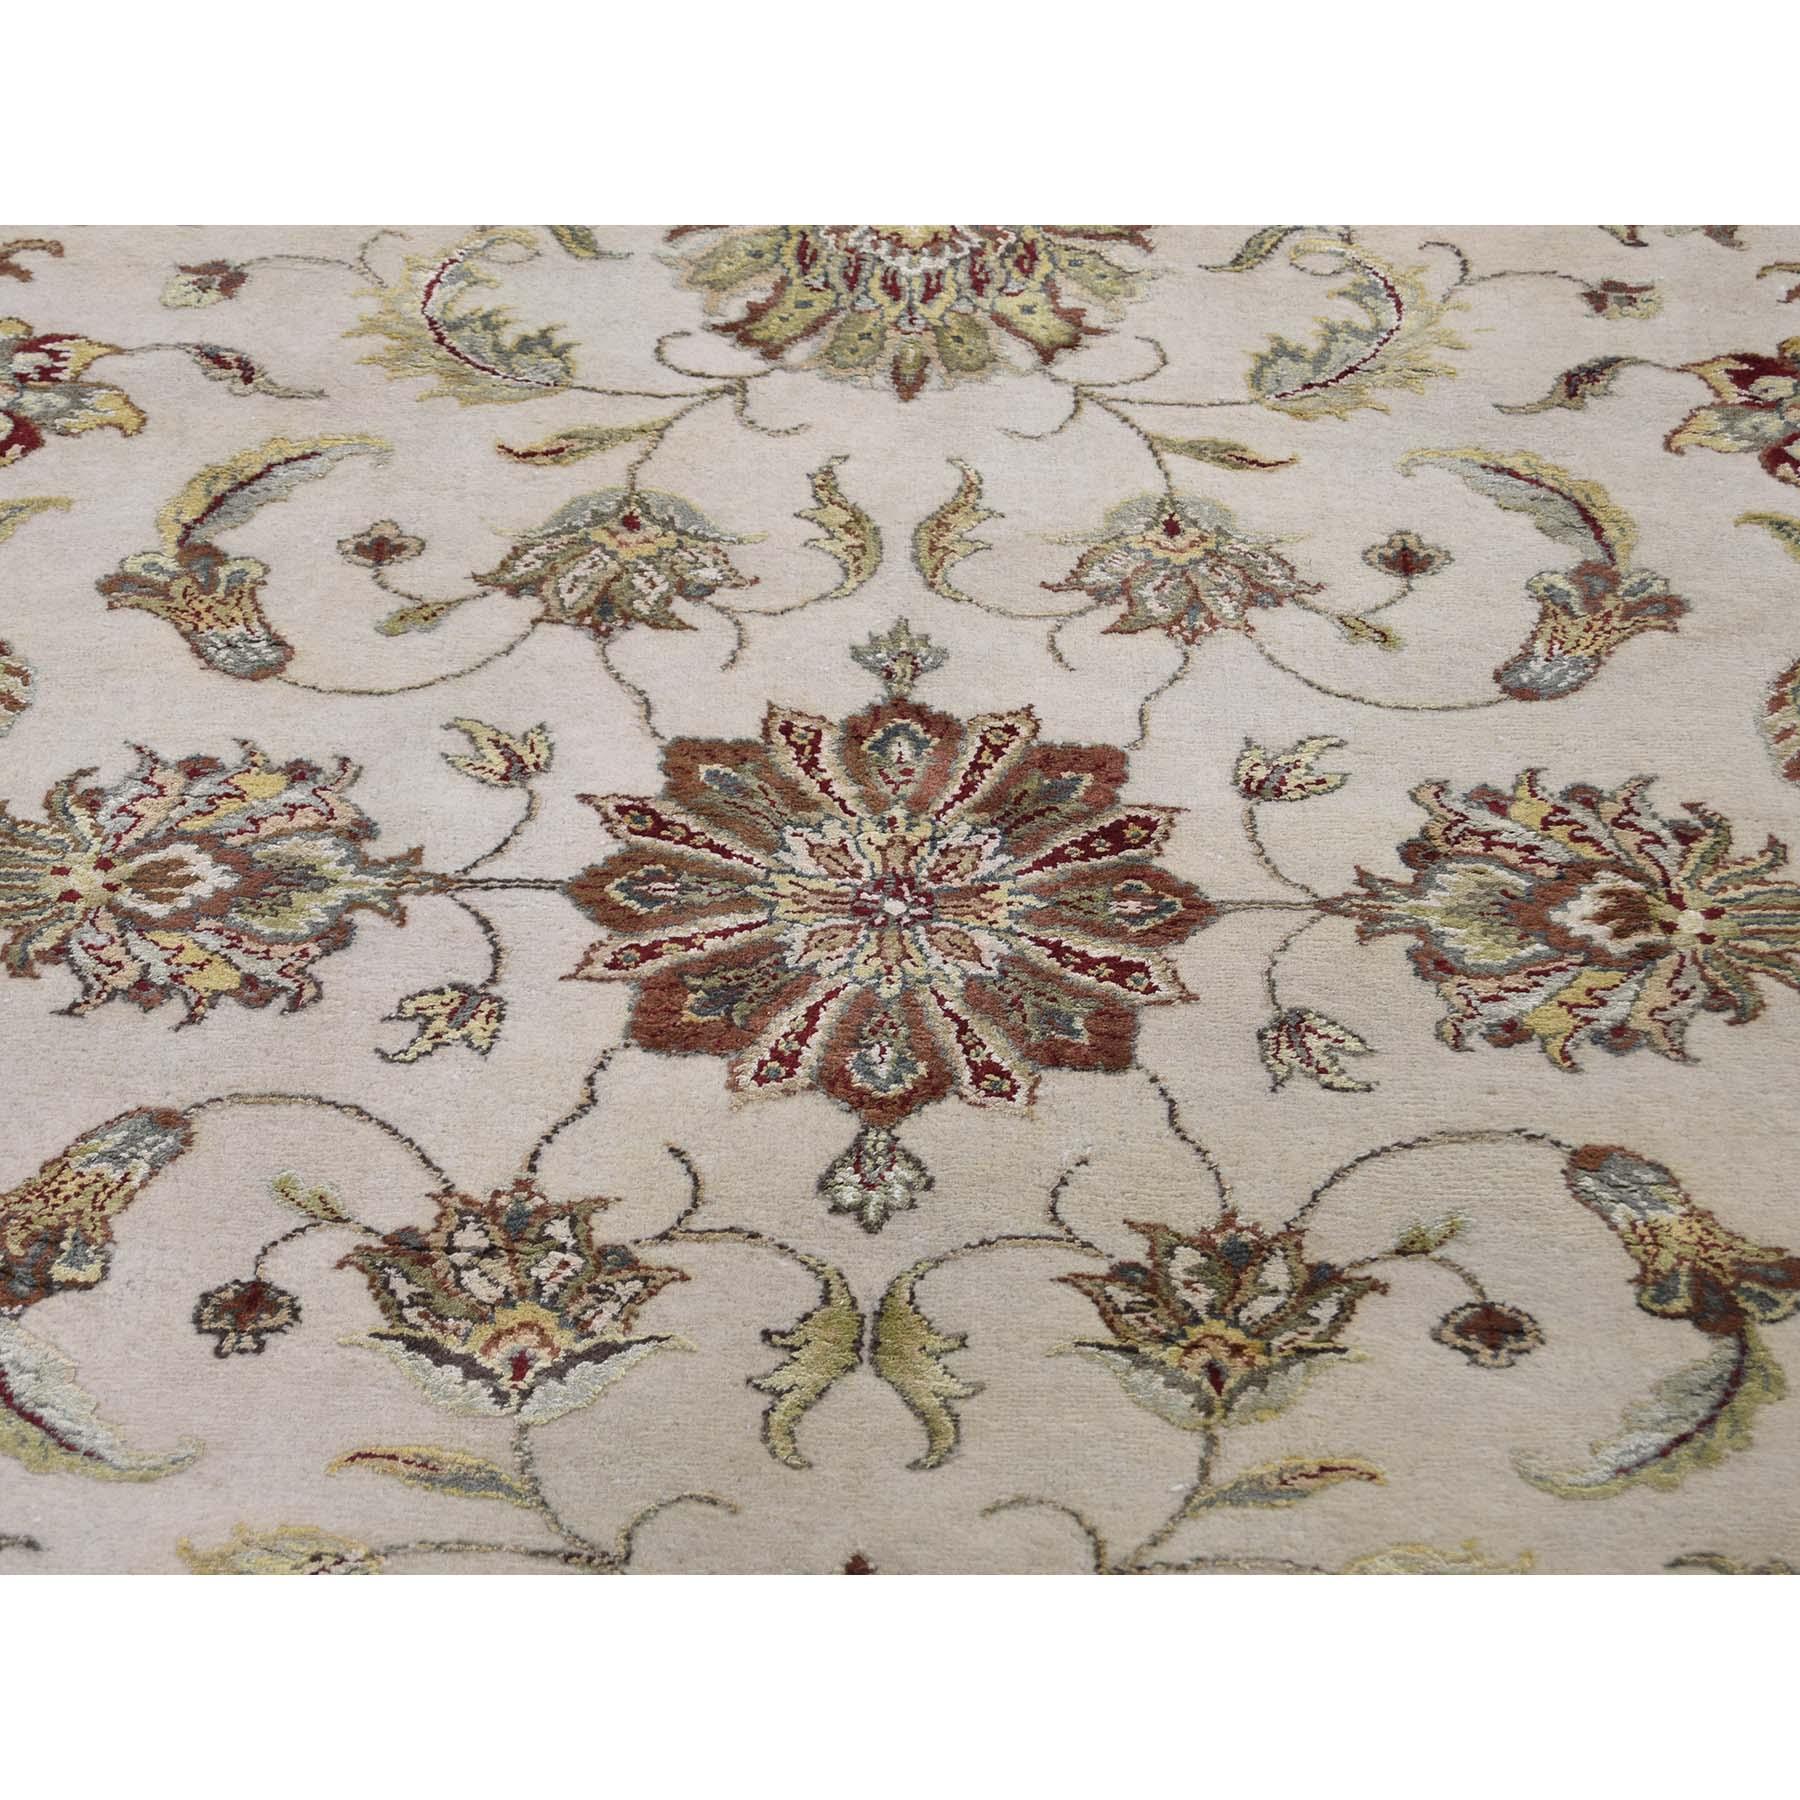 12-x15-3  Oversized Hand-Knotted Half Wool & Half Silk Rajasthan Oriental Rug